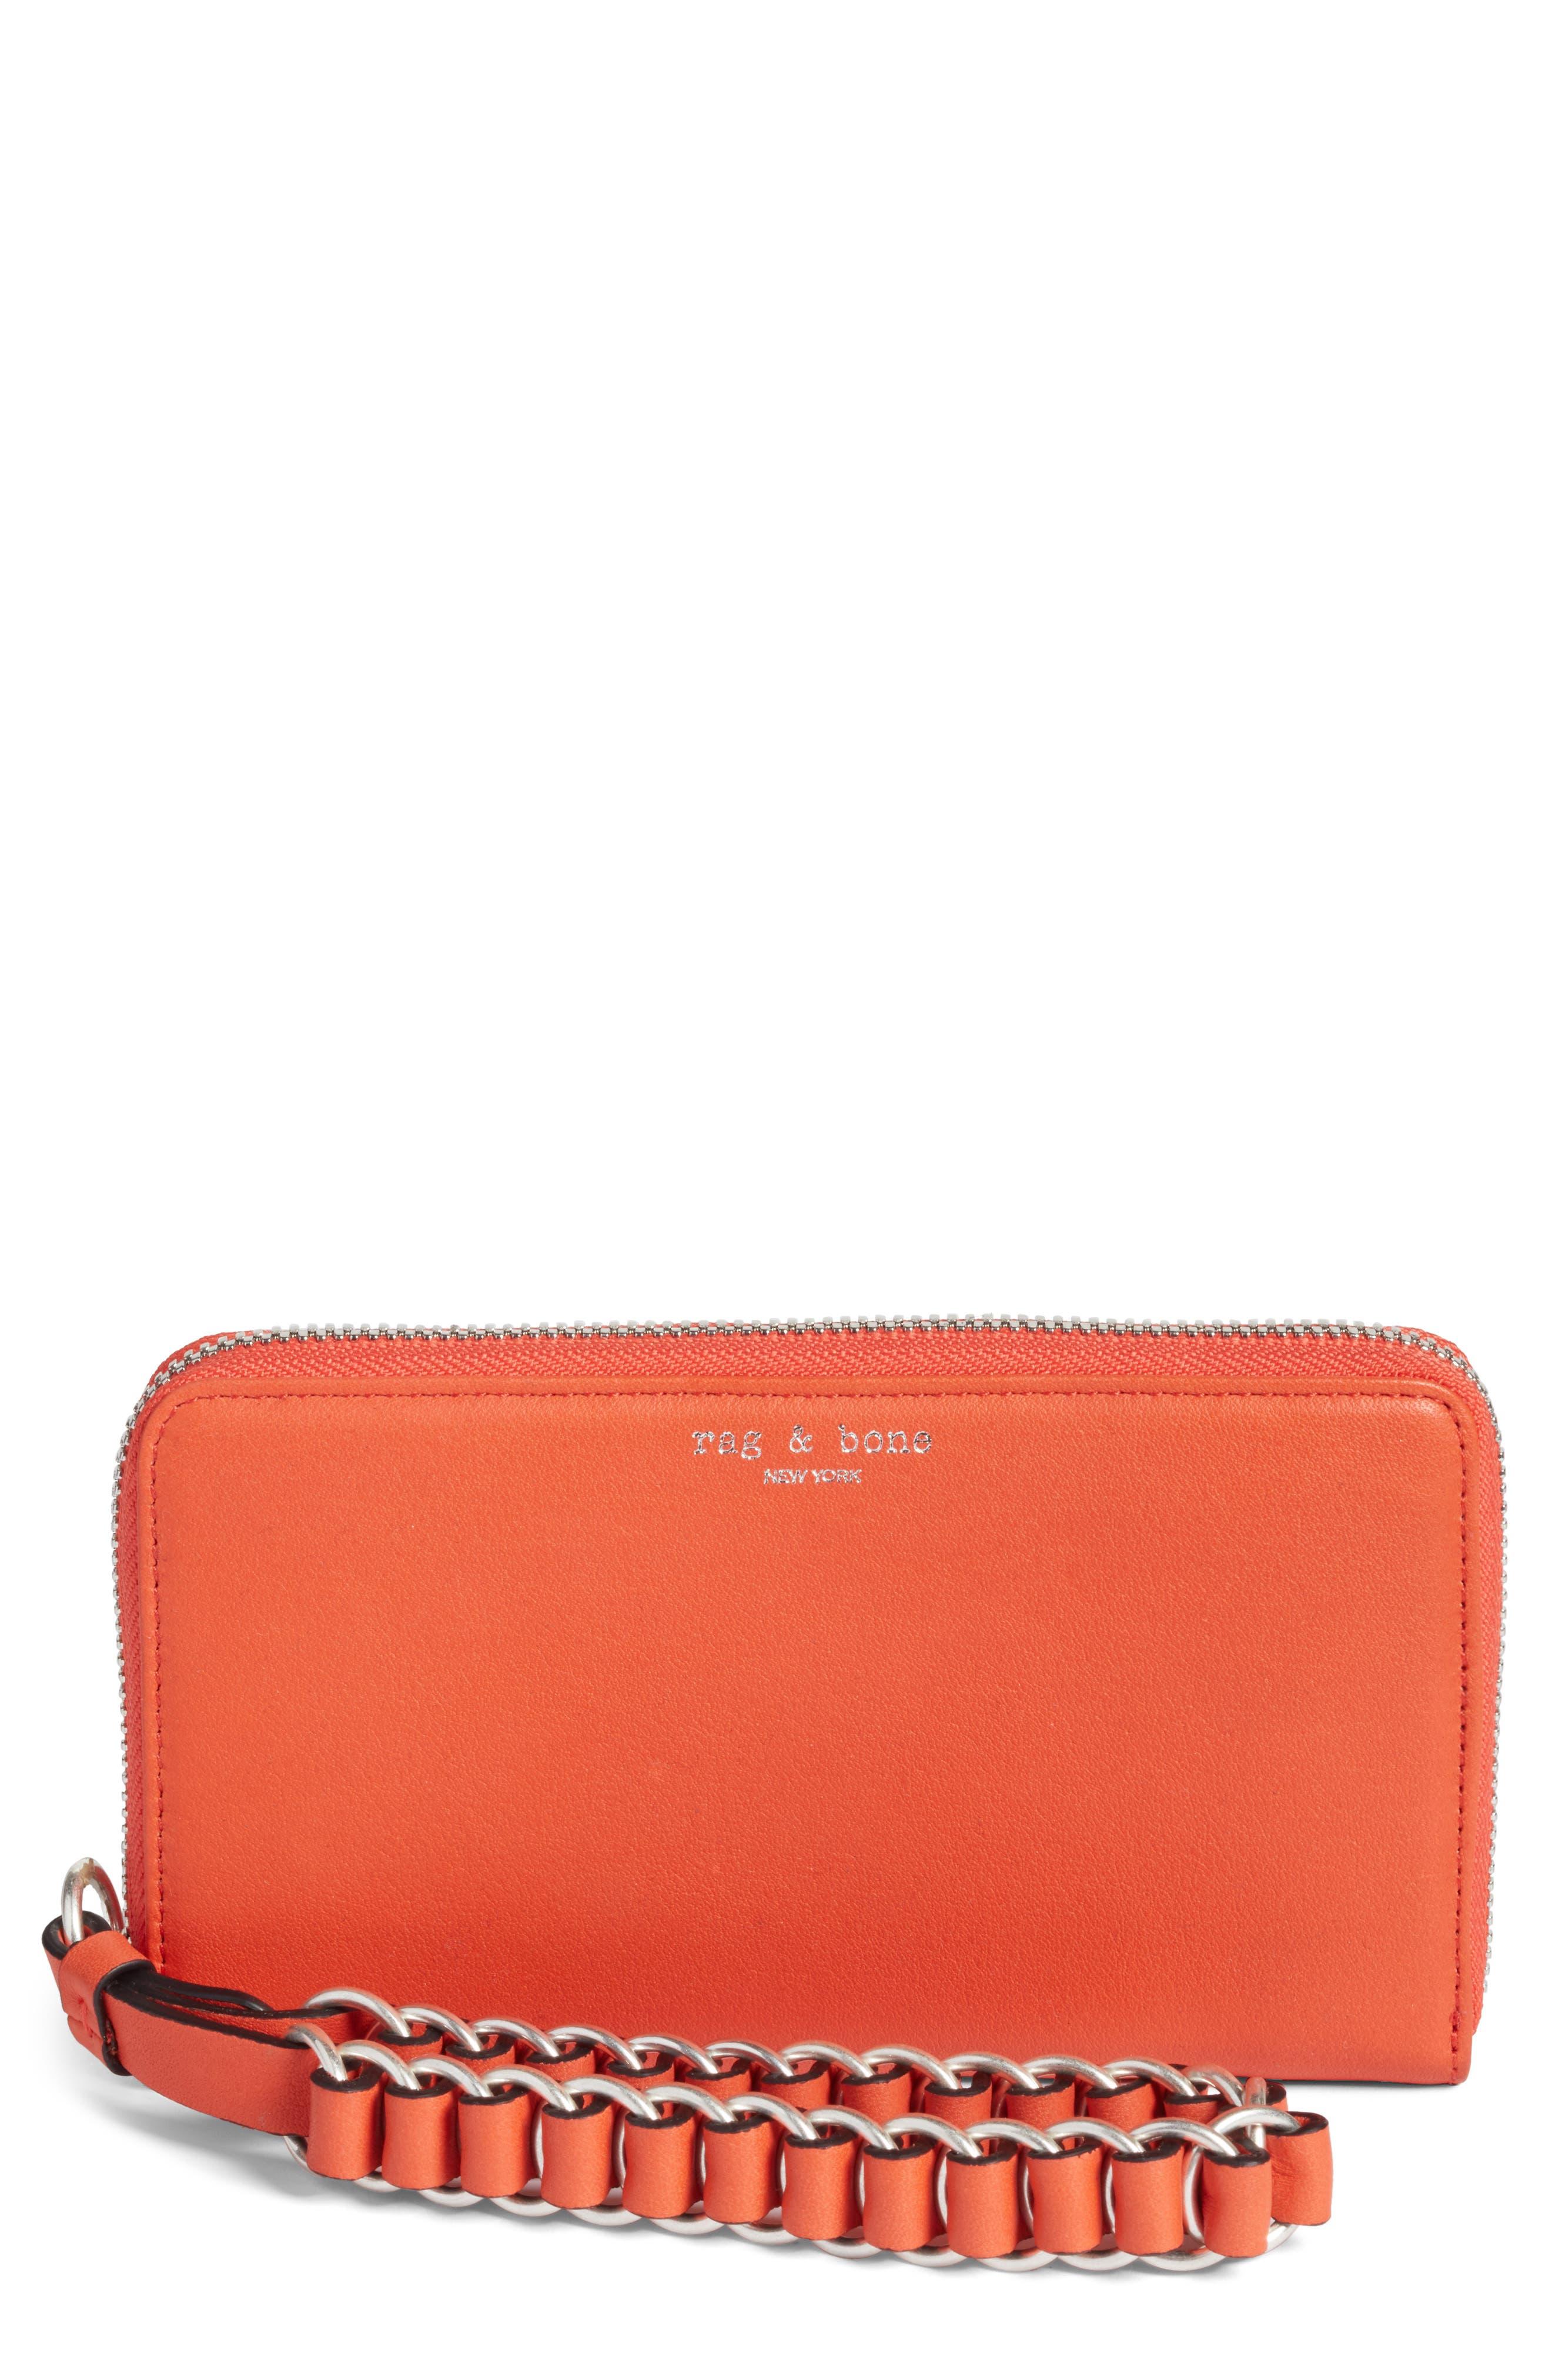 RAG & BONE Devon Zip Leather Smartphone Wallet